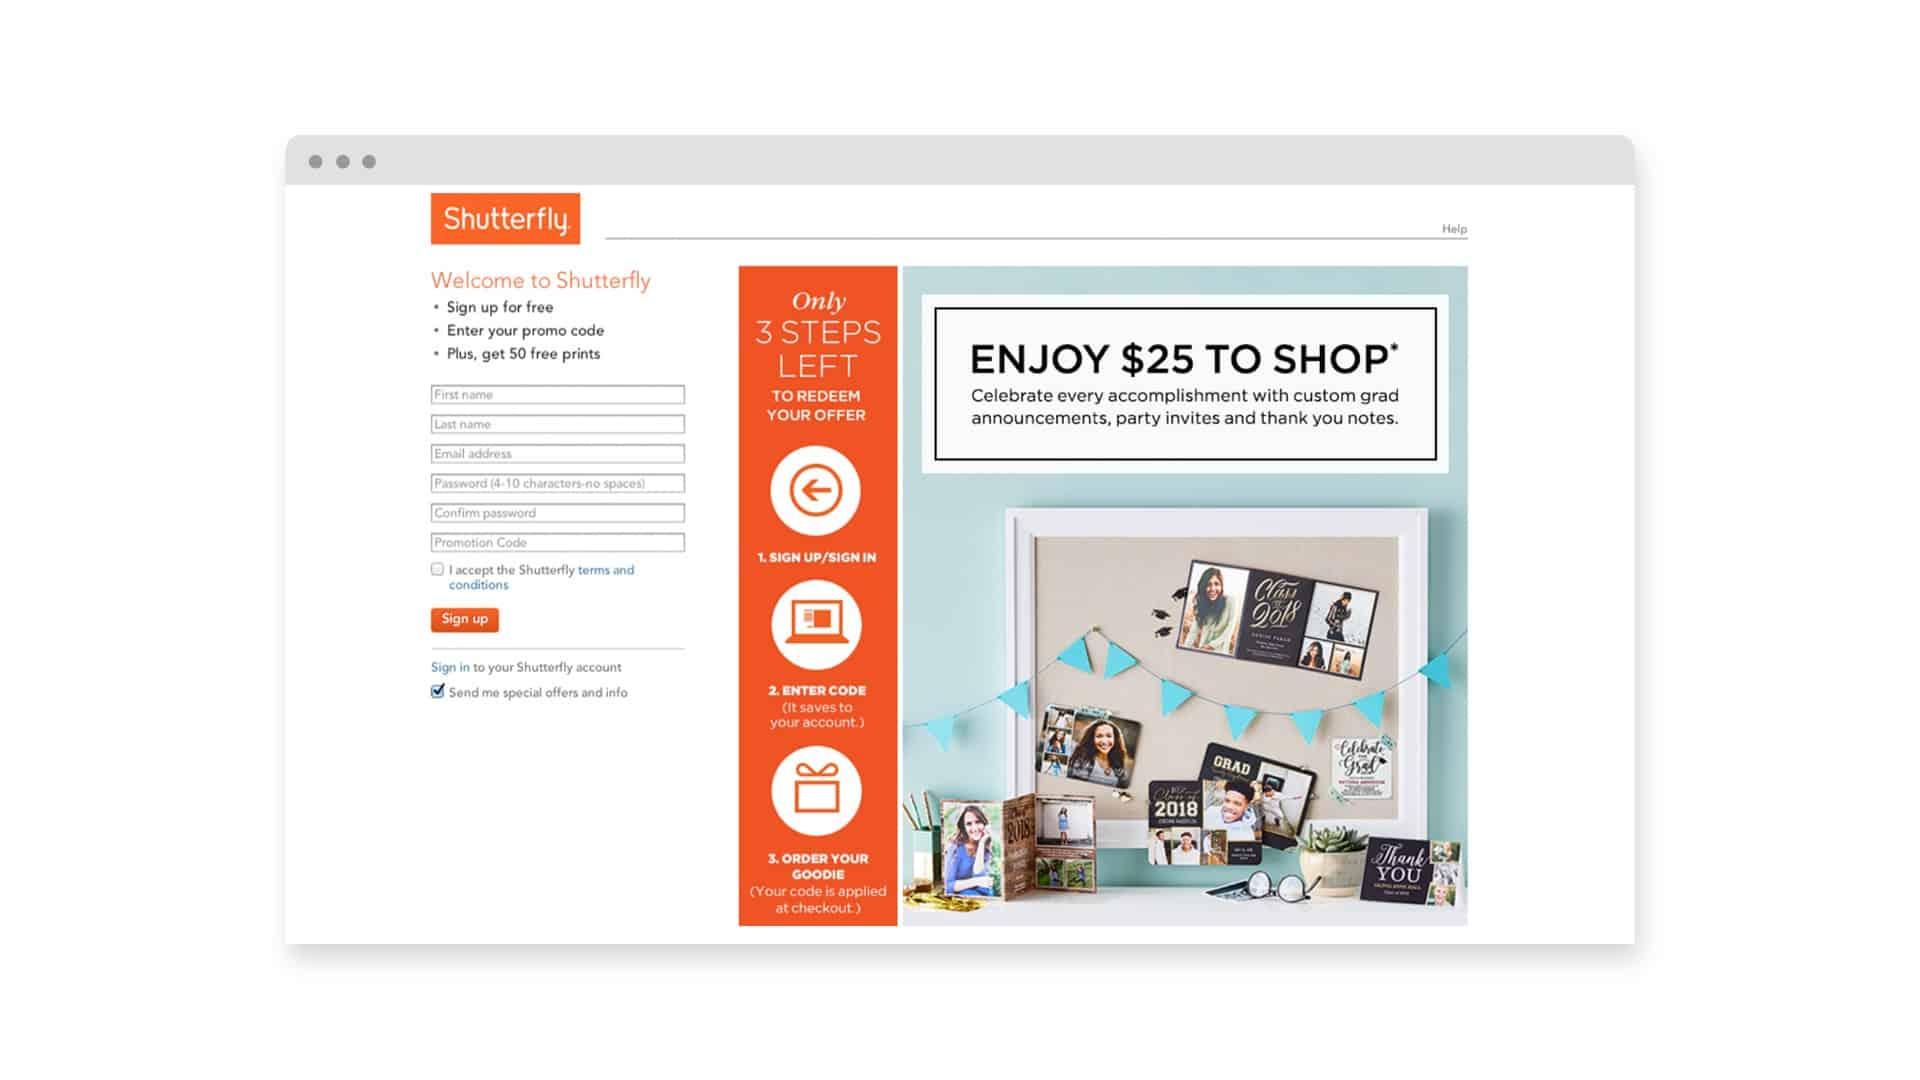 Shutterfly Enjoy $25 To Shop - Brand Advertising Agency - Citizen Best